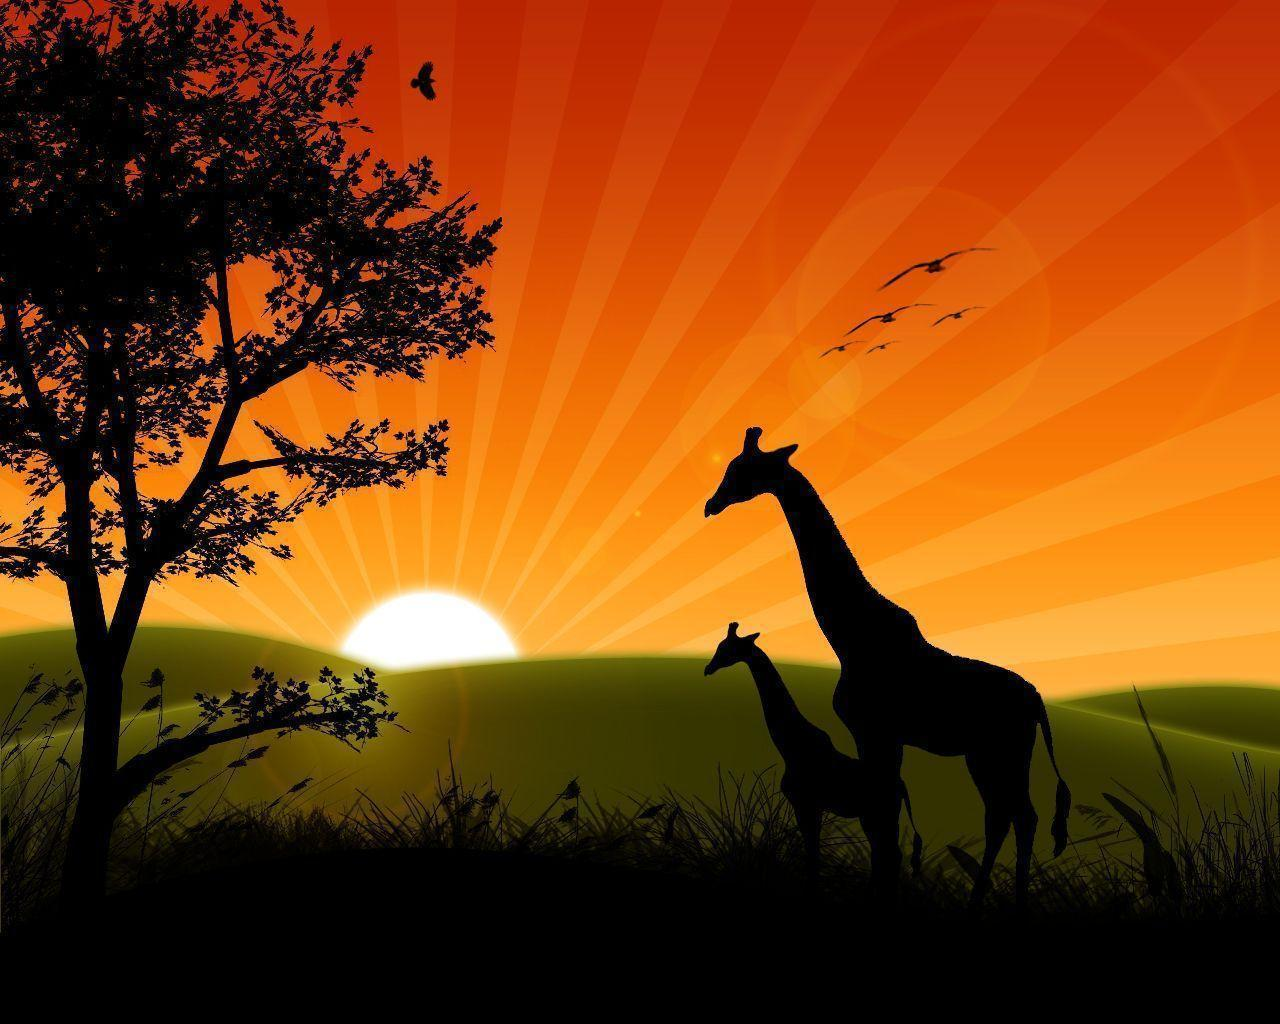 Sunrise Wallpaper Animated Hd Widescreen 11 HD Wallpapers | Eakai.